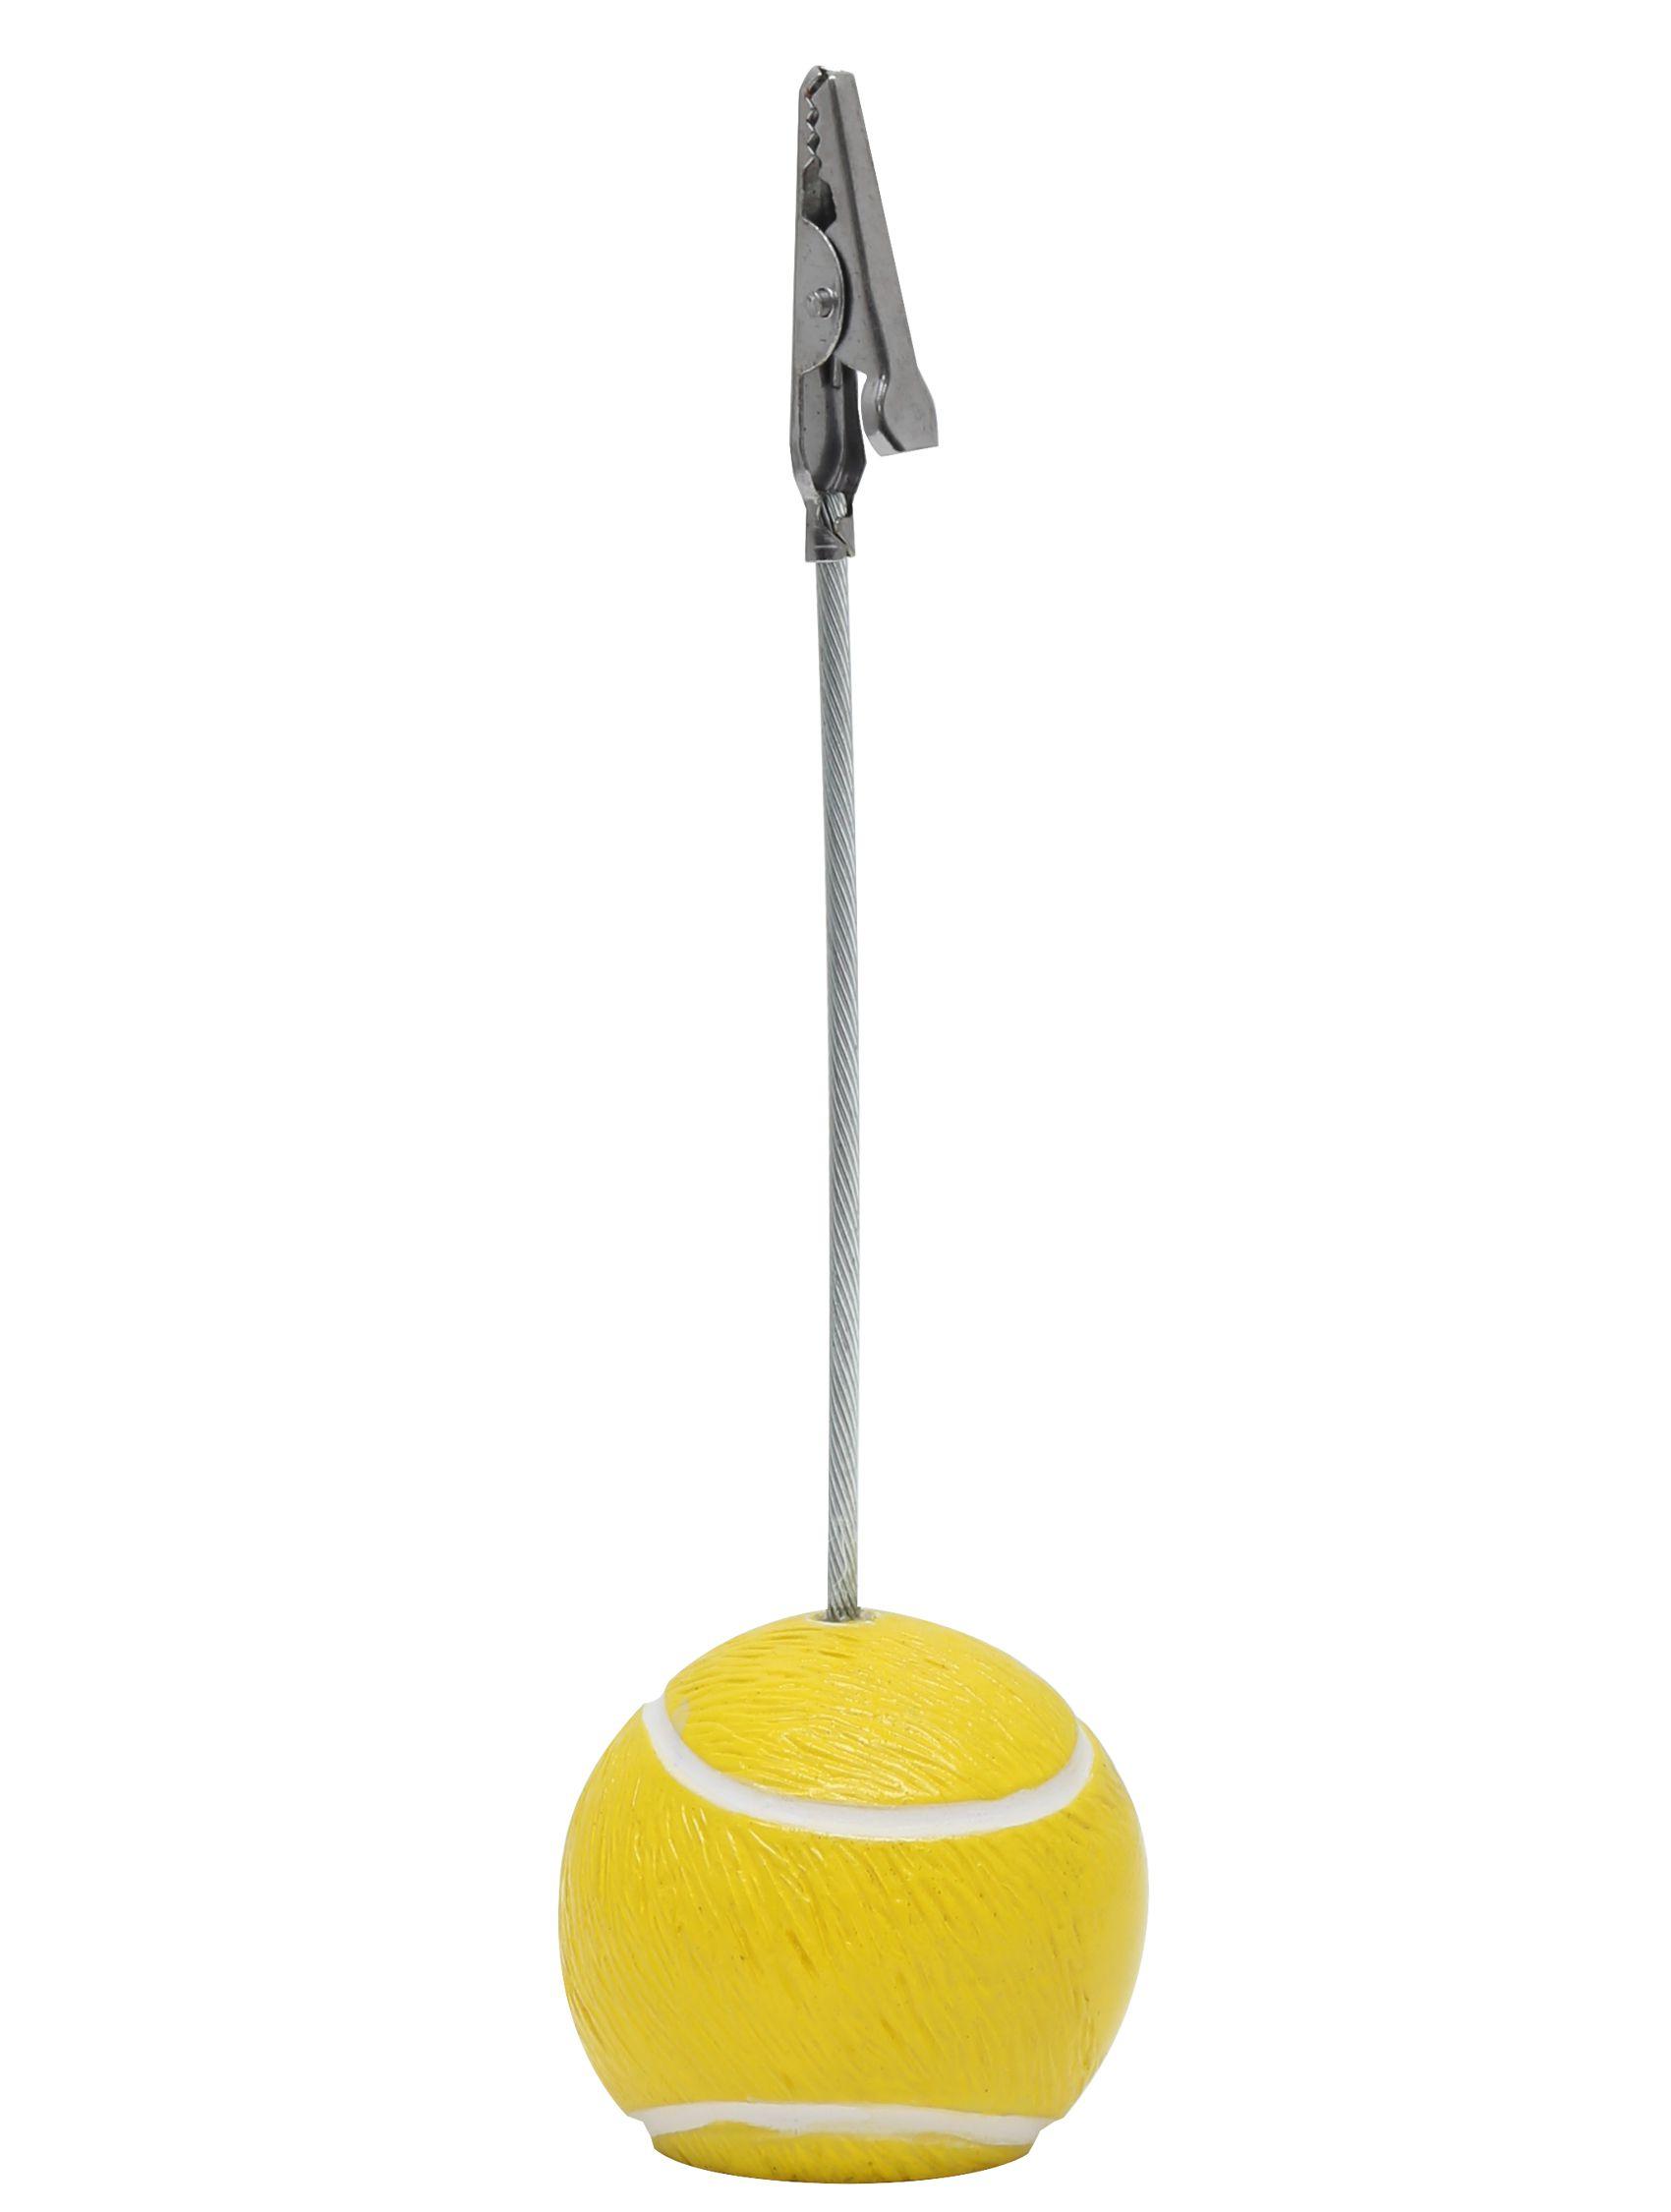 fotoclip met tennisbal, 12,5 cm hoog S65CN3